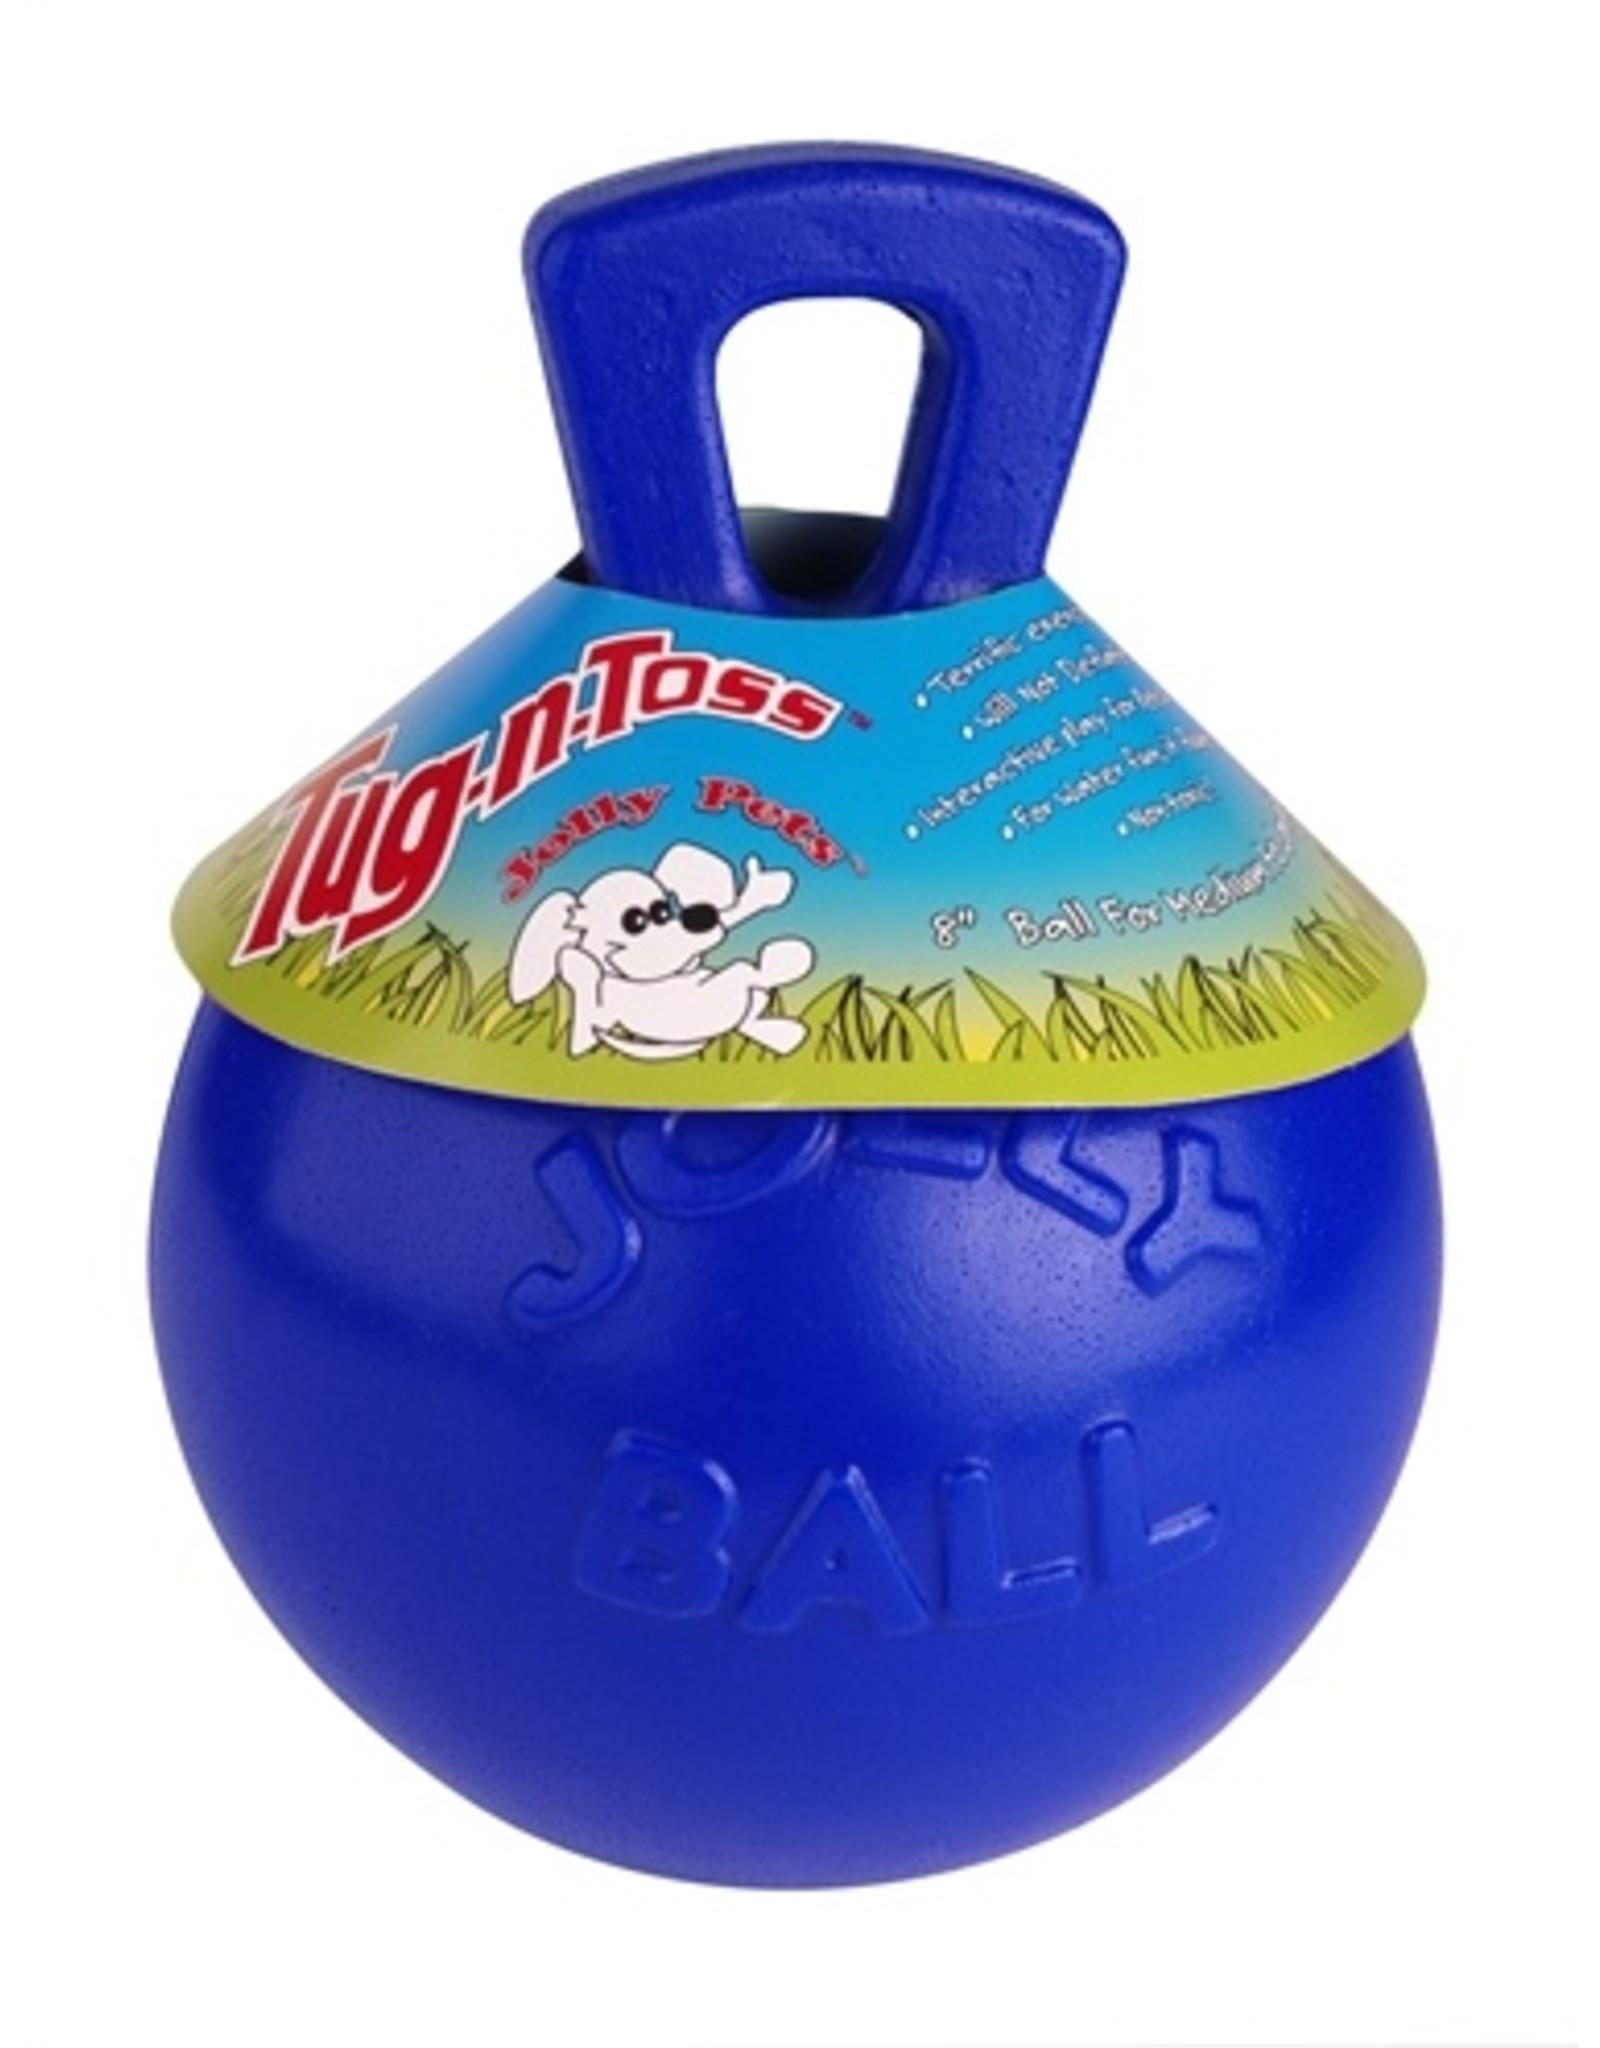 Jolly Jolly tug-n-toss bal blauw